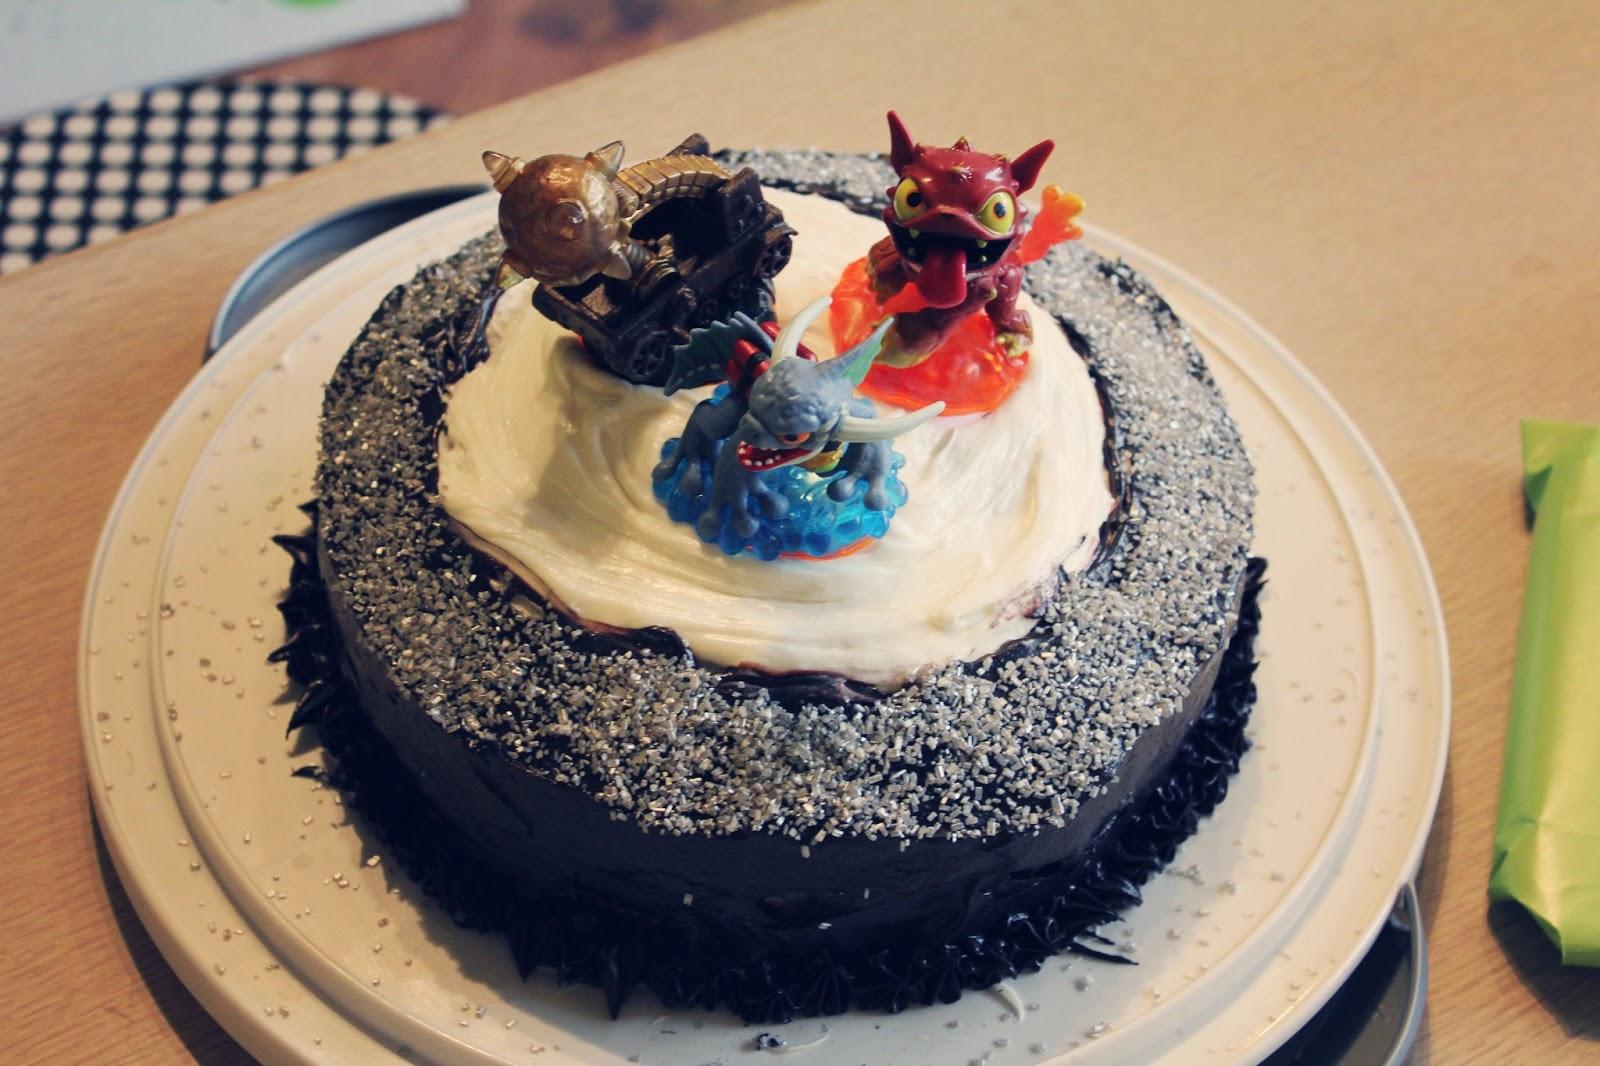 sassafras skylander giant cake cake decorating